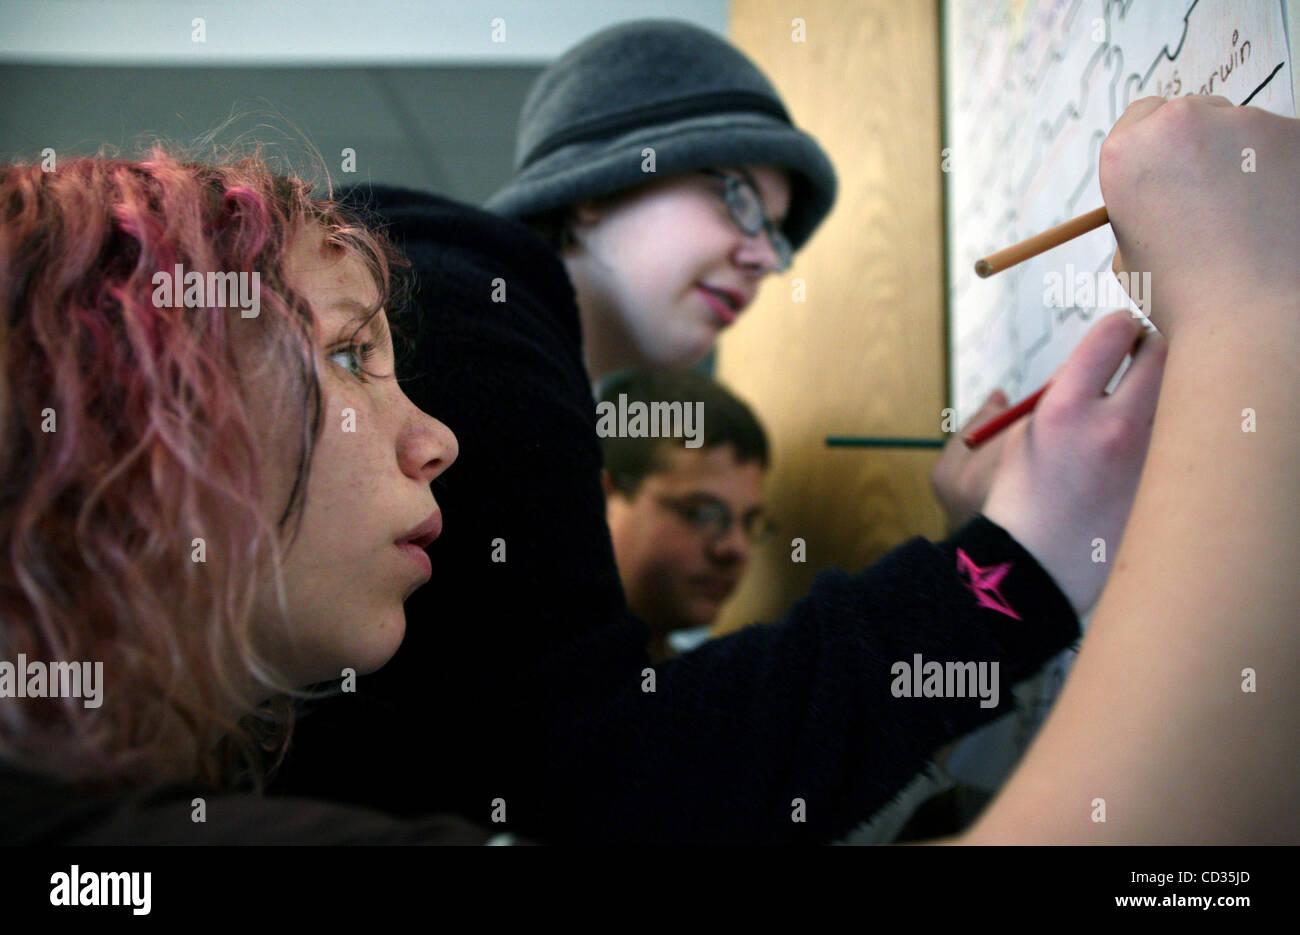 JENNIFER SIMONSON • jsimonson@startribune.com St. Paul, MN-apr. 8, 2008] Grande Fiume scuola junior Immagini Stock